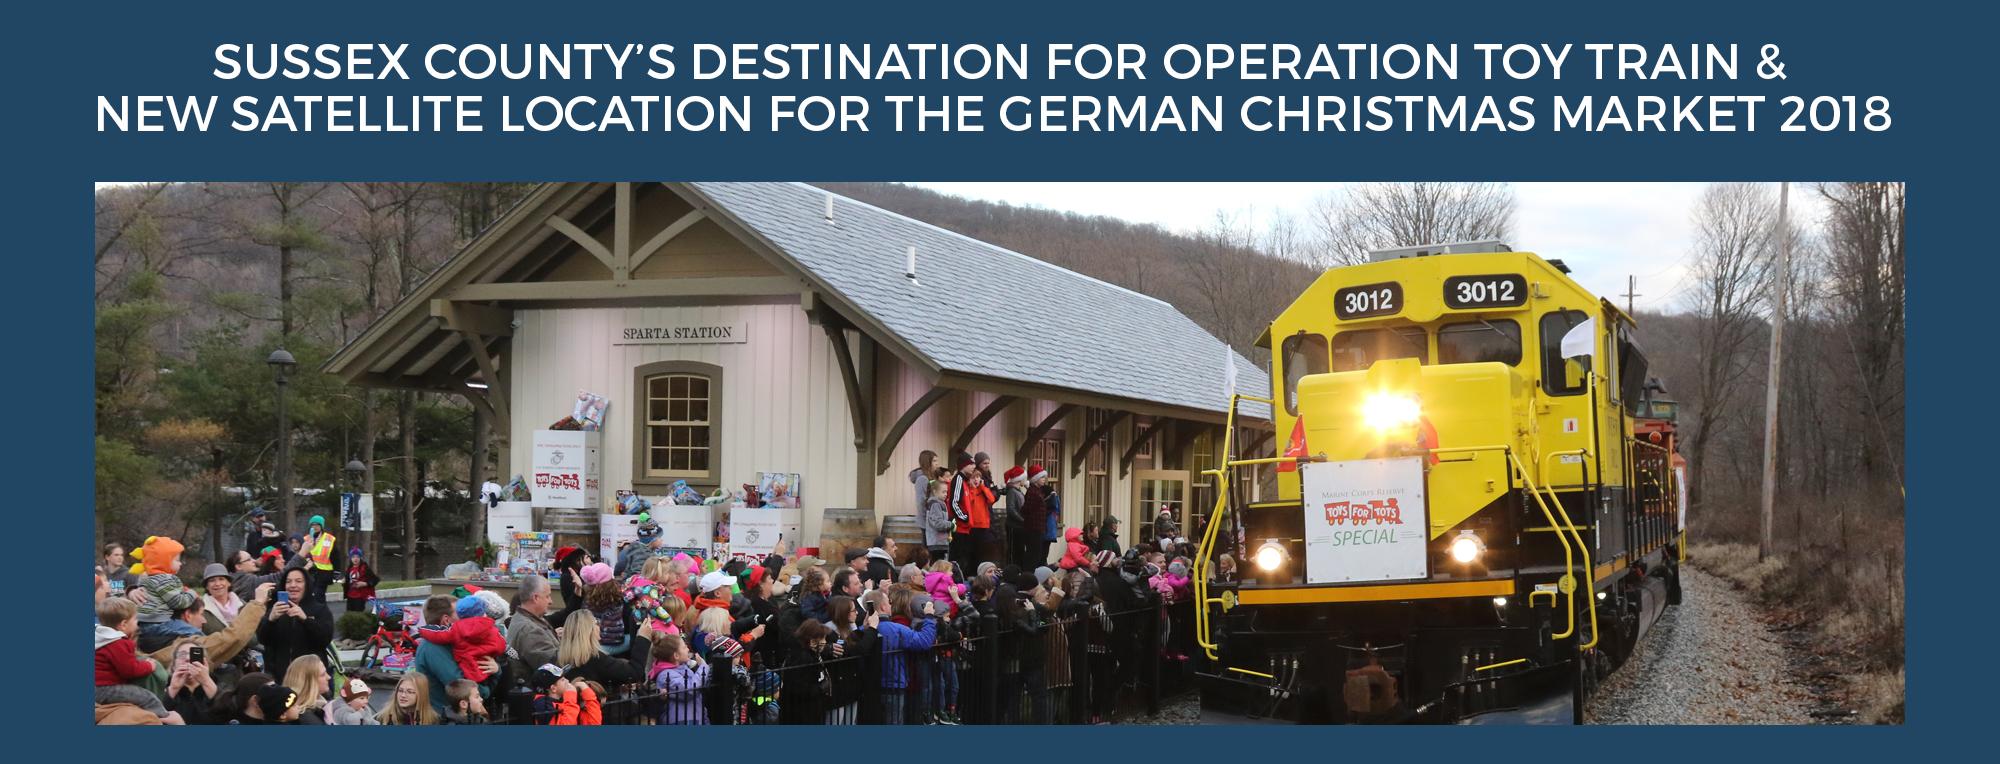 german-market-toy-train.jpg